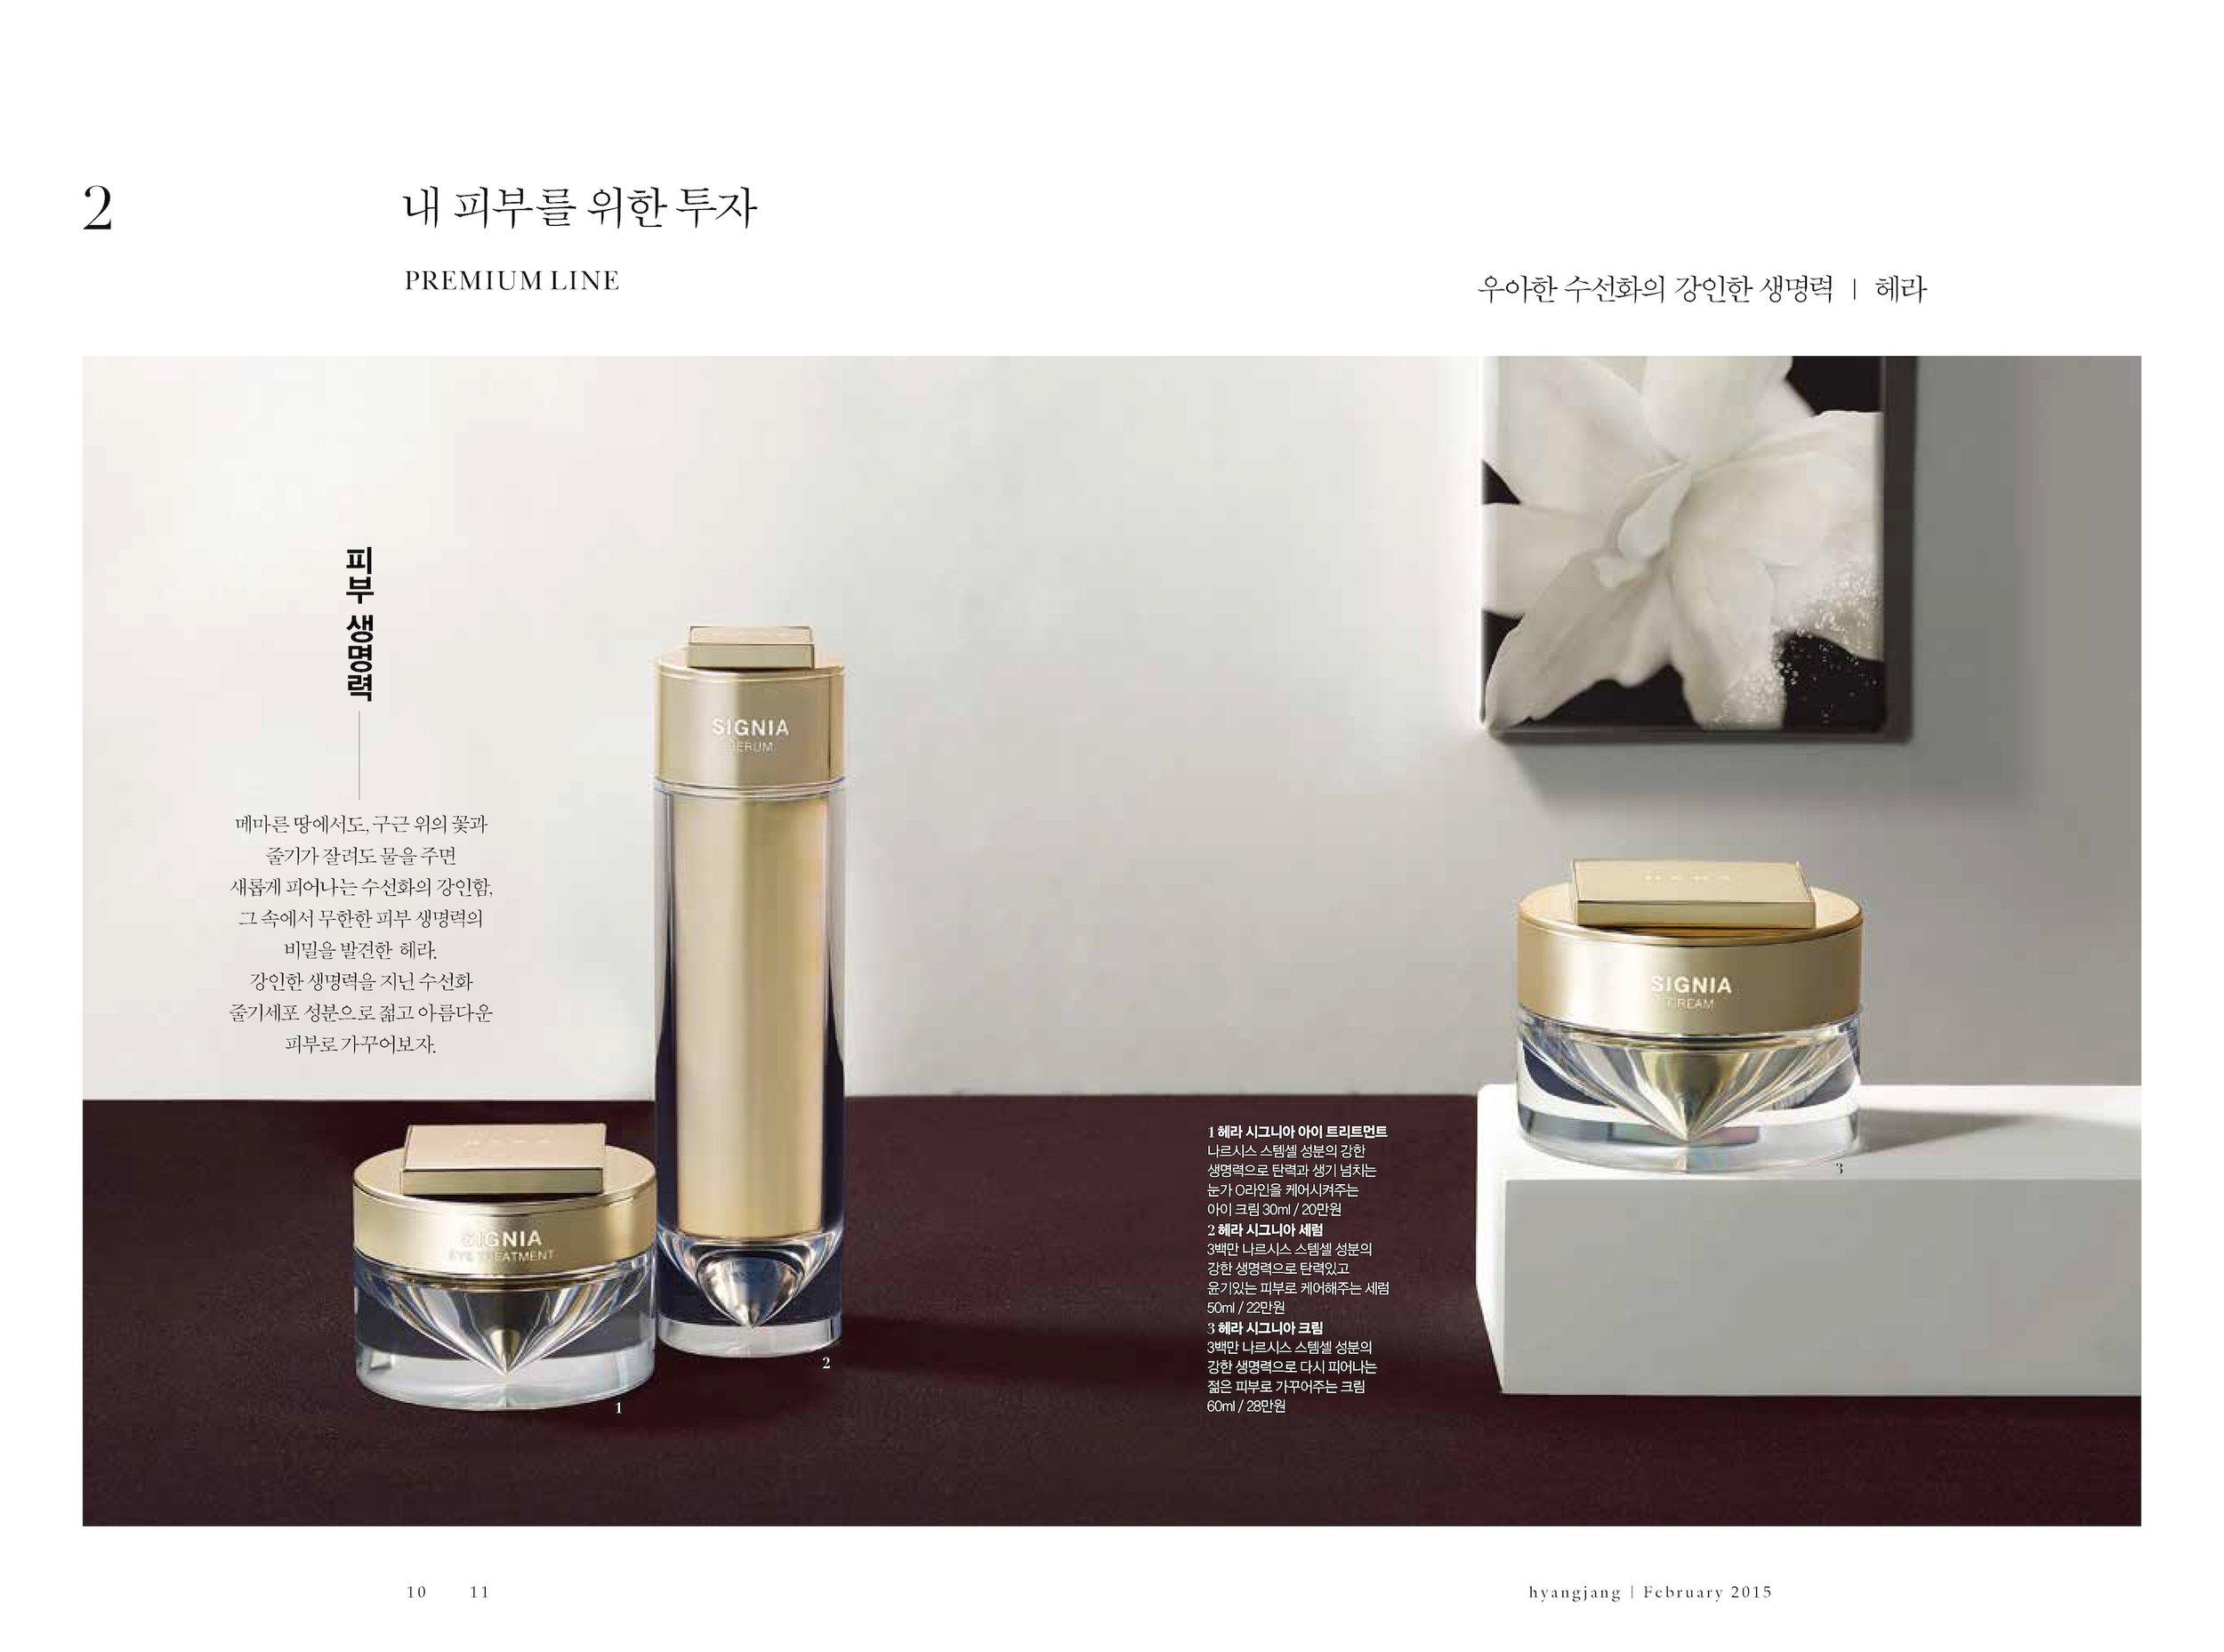 hyangjang-201502_페이지_06.jpeg